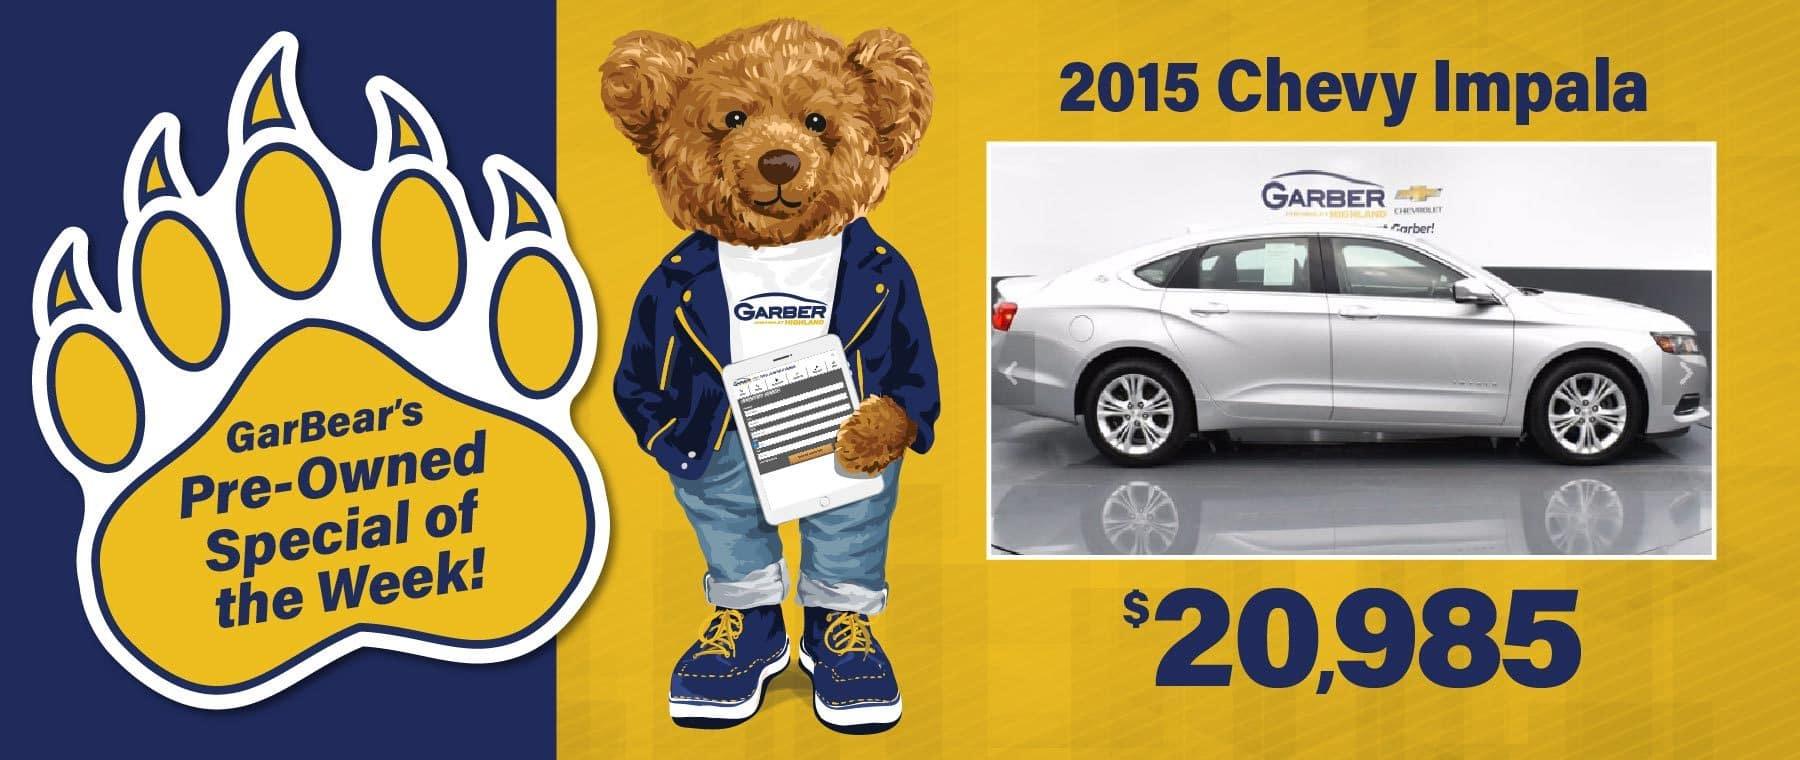 2015 Chevy Impala $20,985